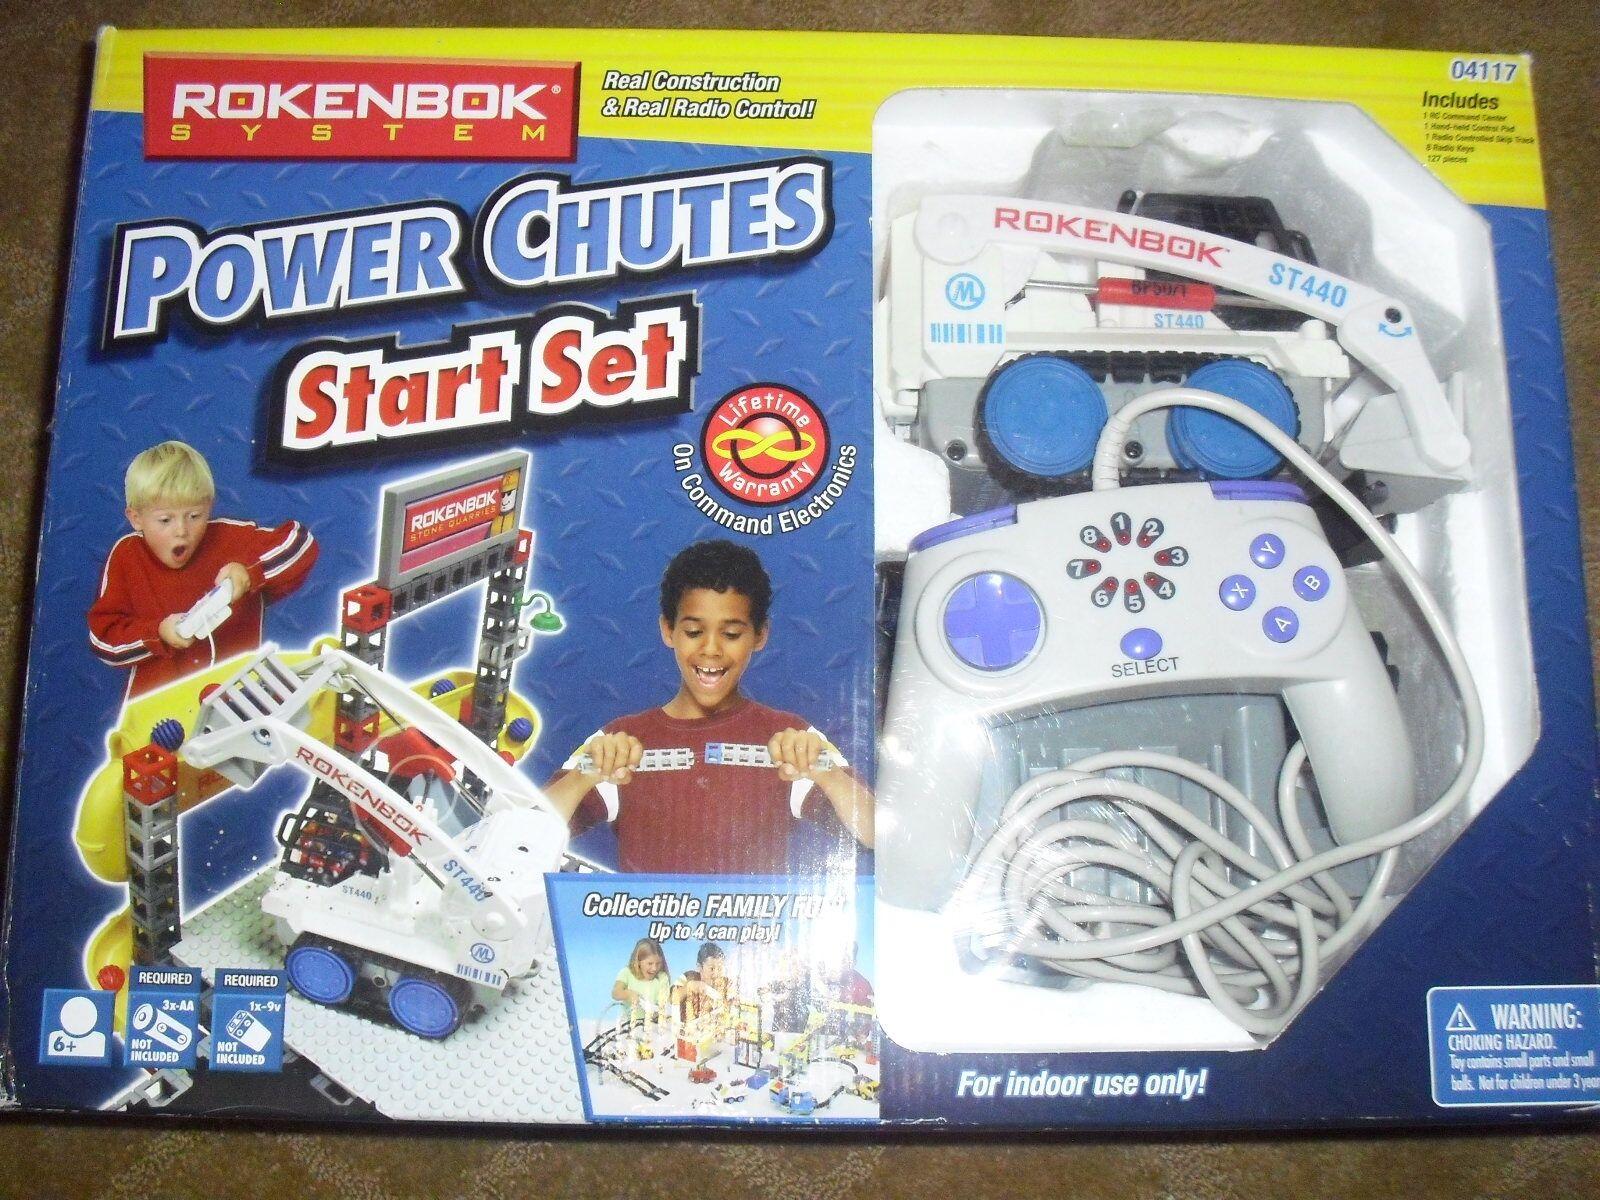 Rokenbok Power Power Power Chutes Start Set 04117 82ec0f